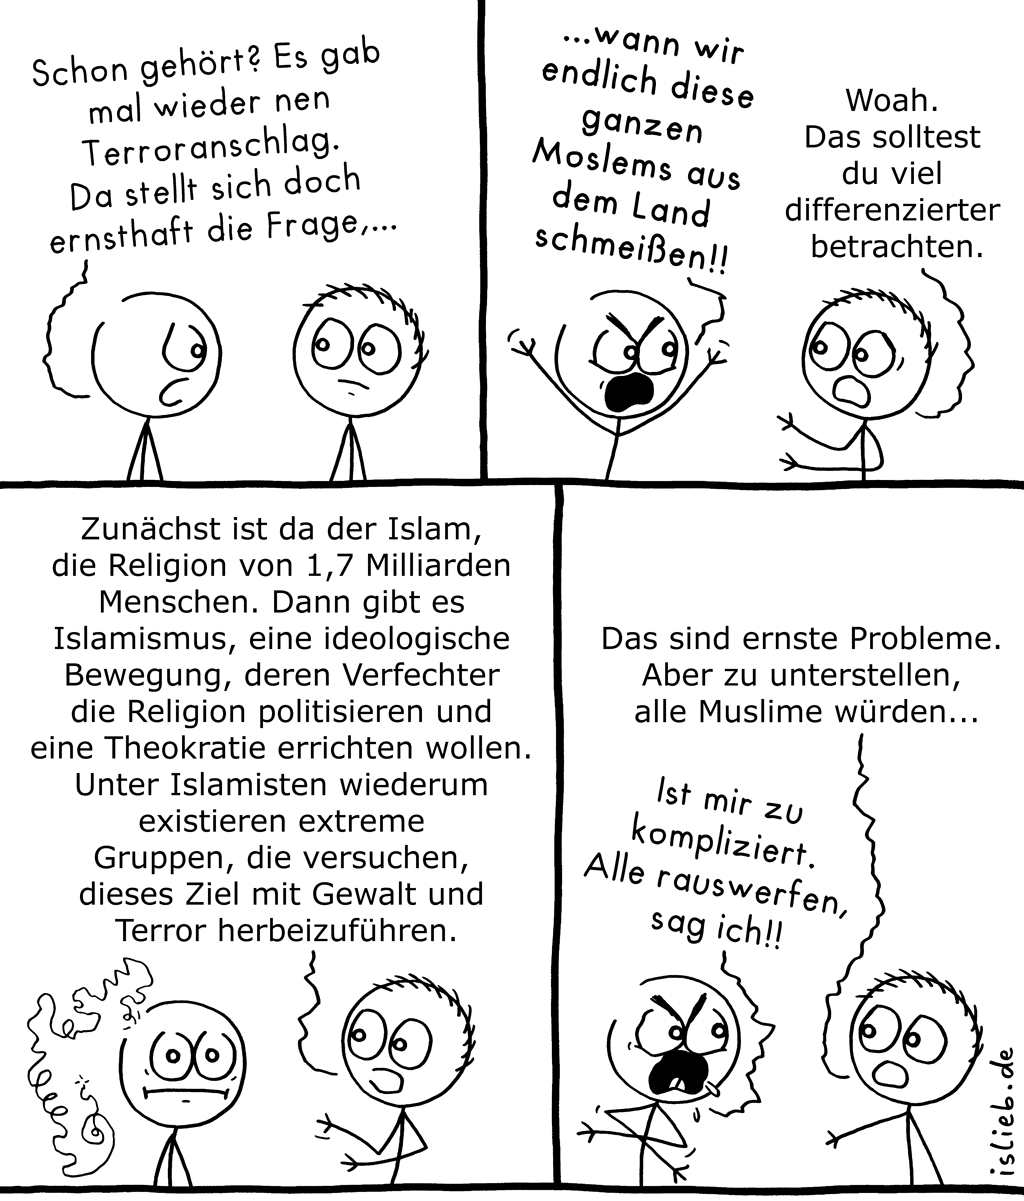 Differenziert betrachten | Politischer Comic | is lieb?